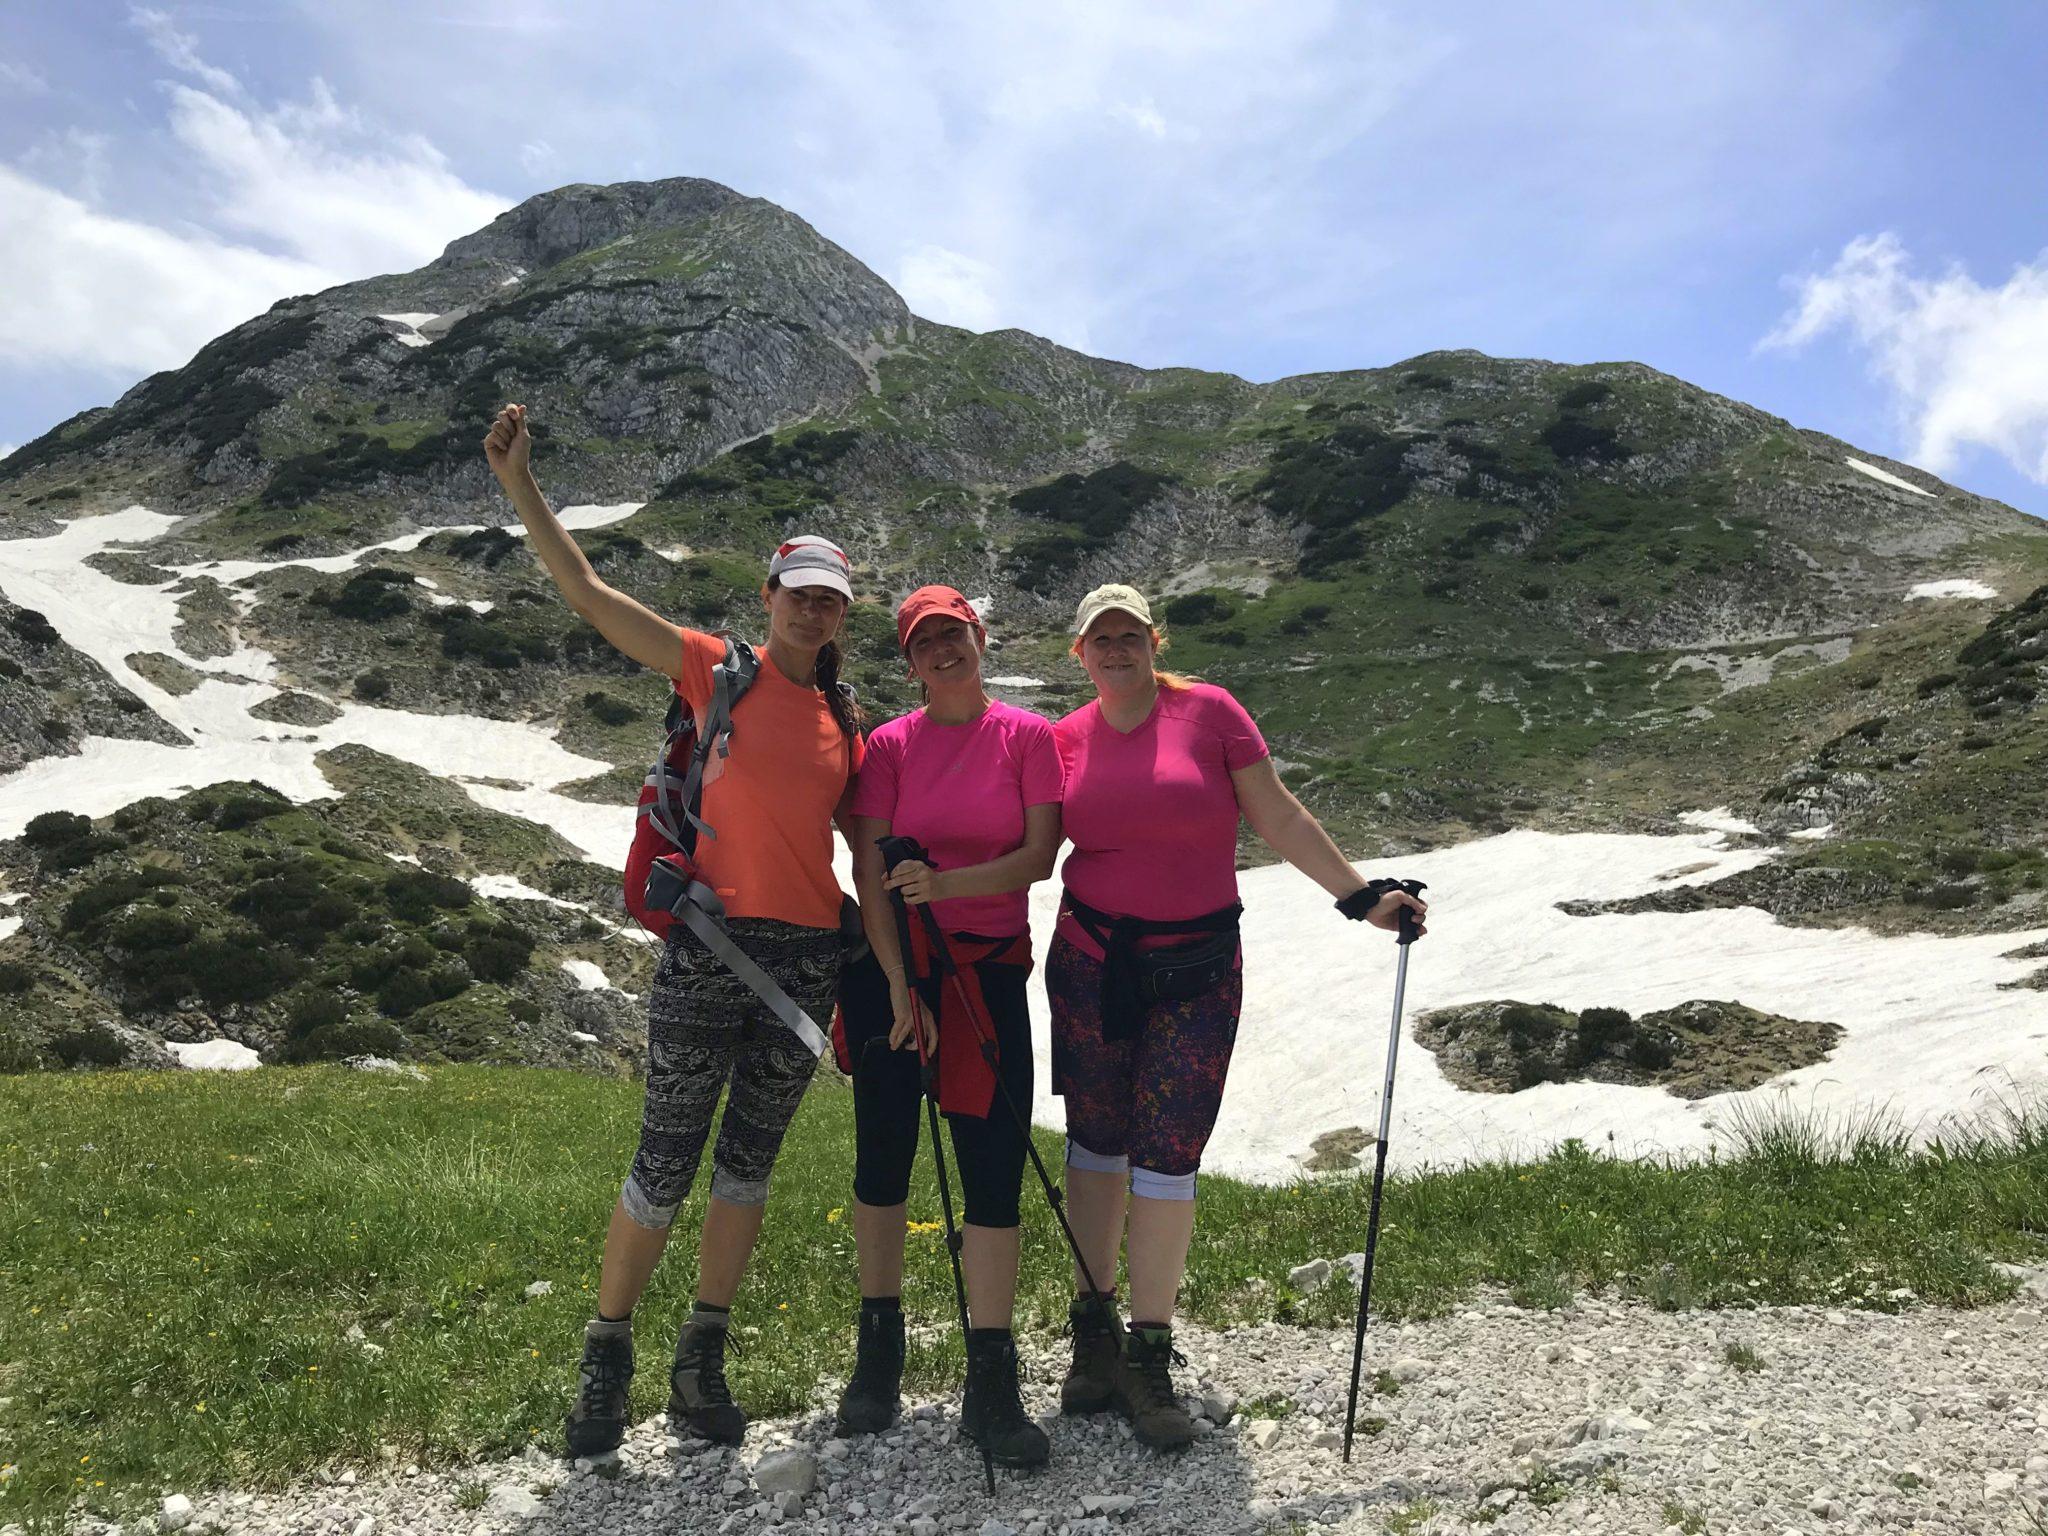 Three women enjoying a hike in the Triglav National Park